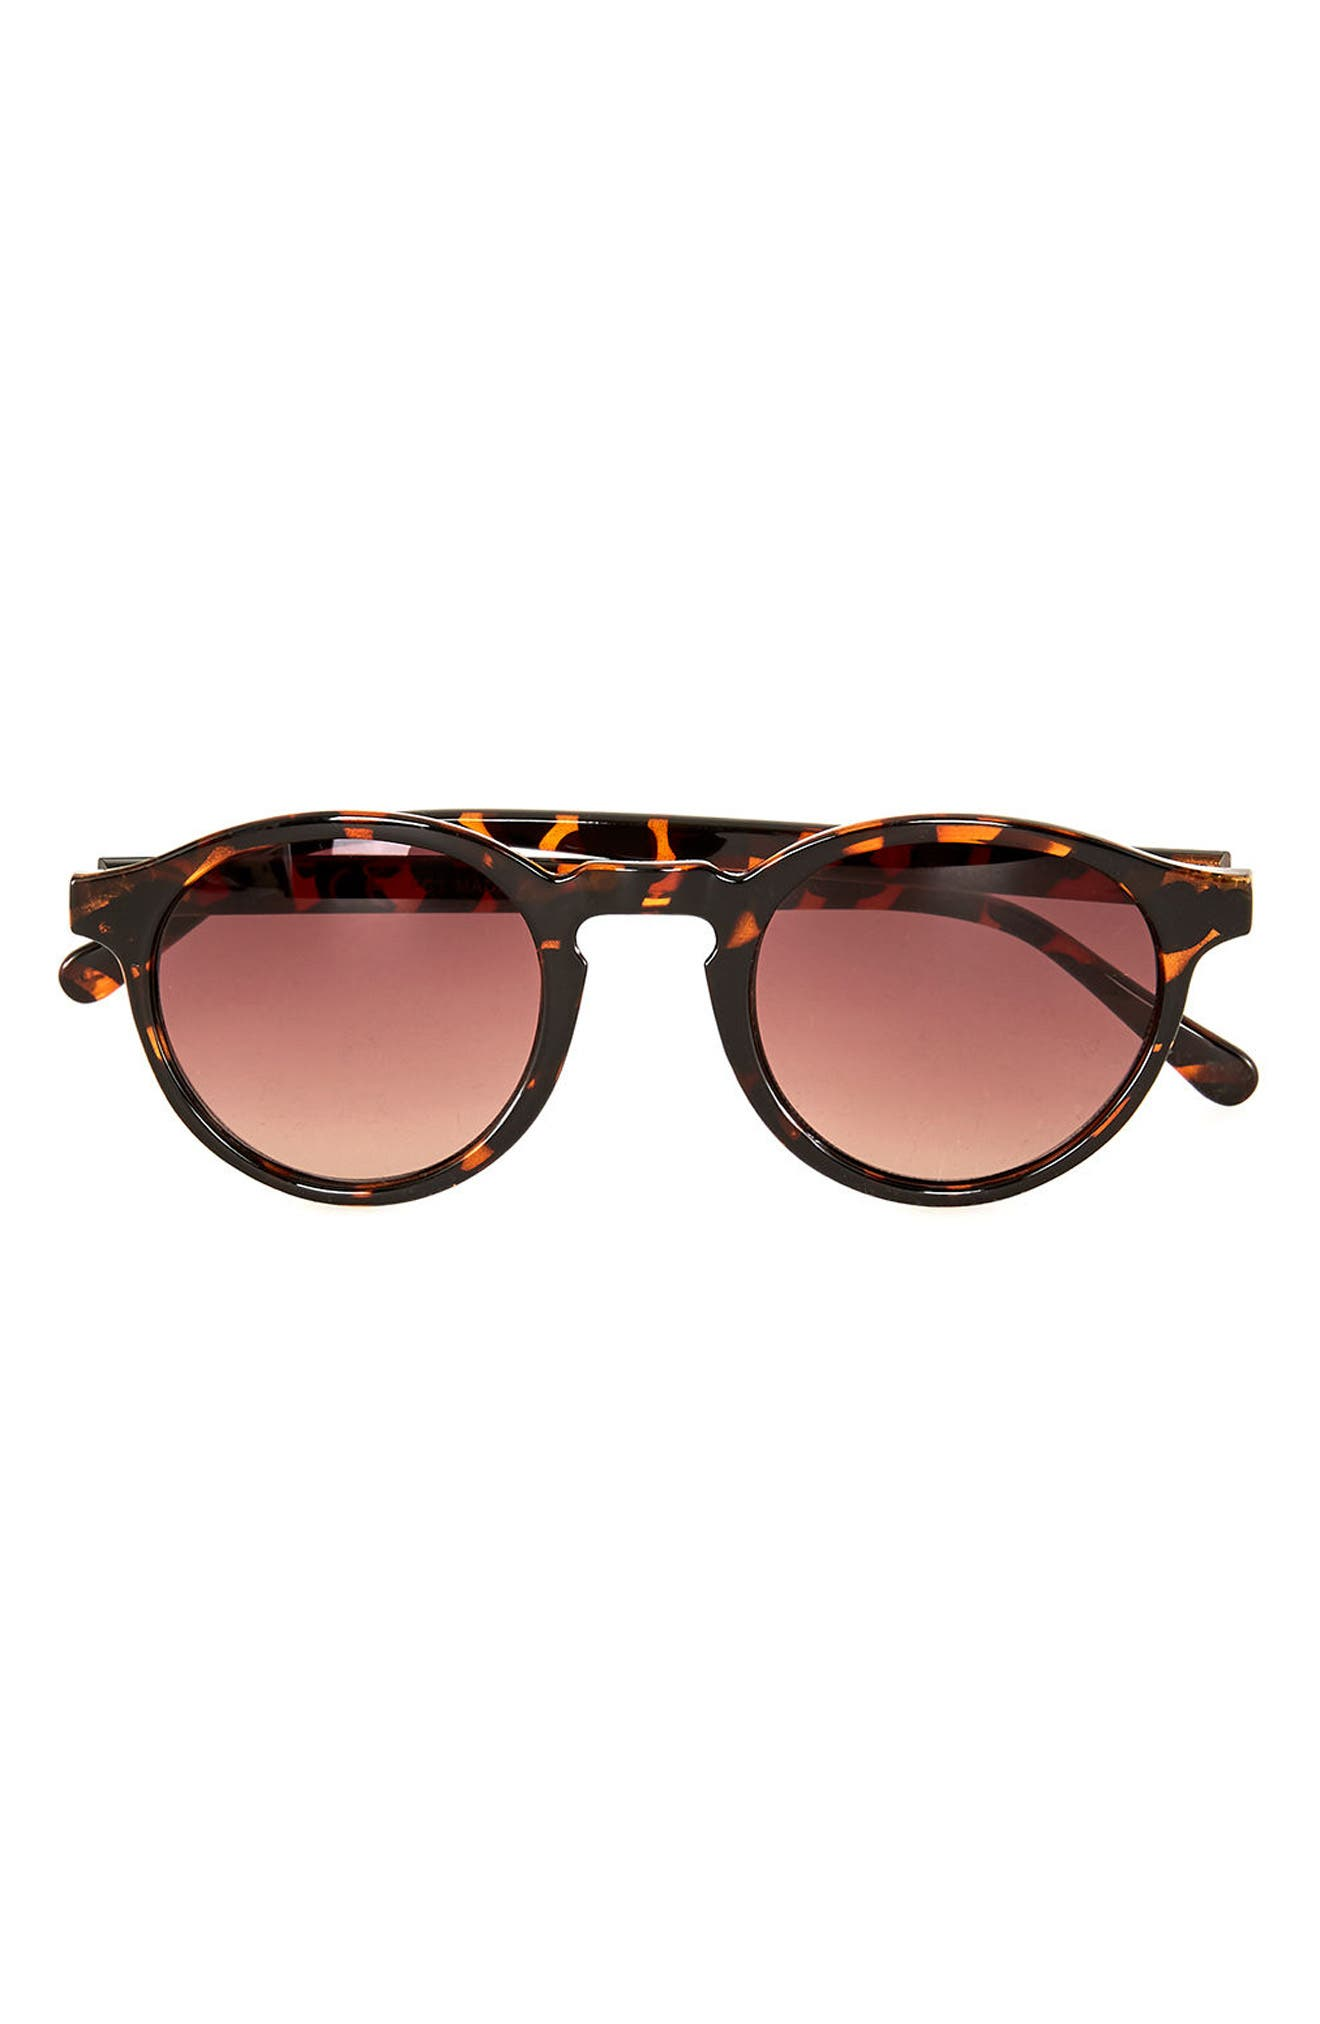 Topman 44mm Round Sunglasses